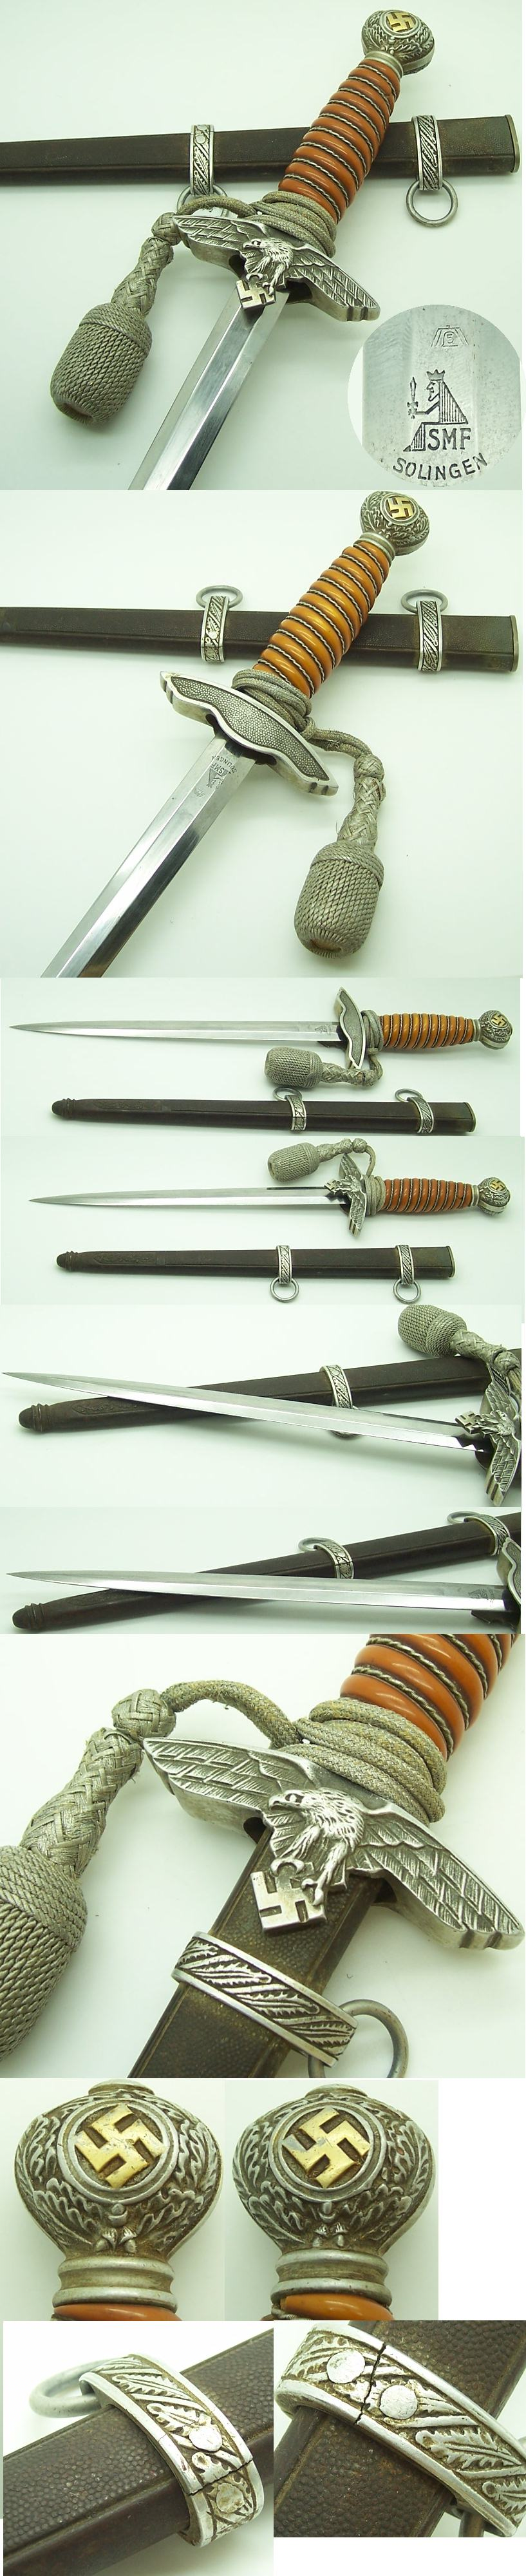 Interesting 2nd Model Luftwaffe Daggers by SMF